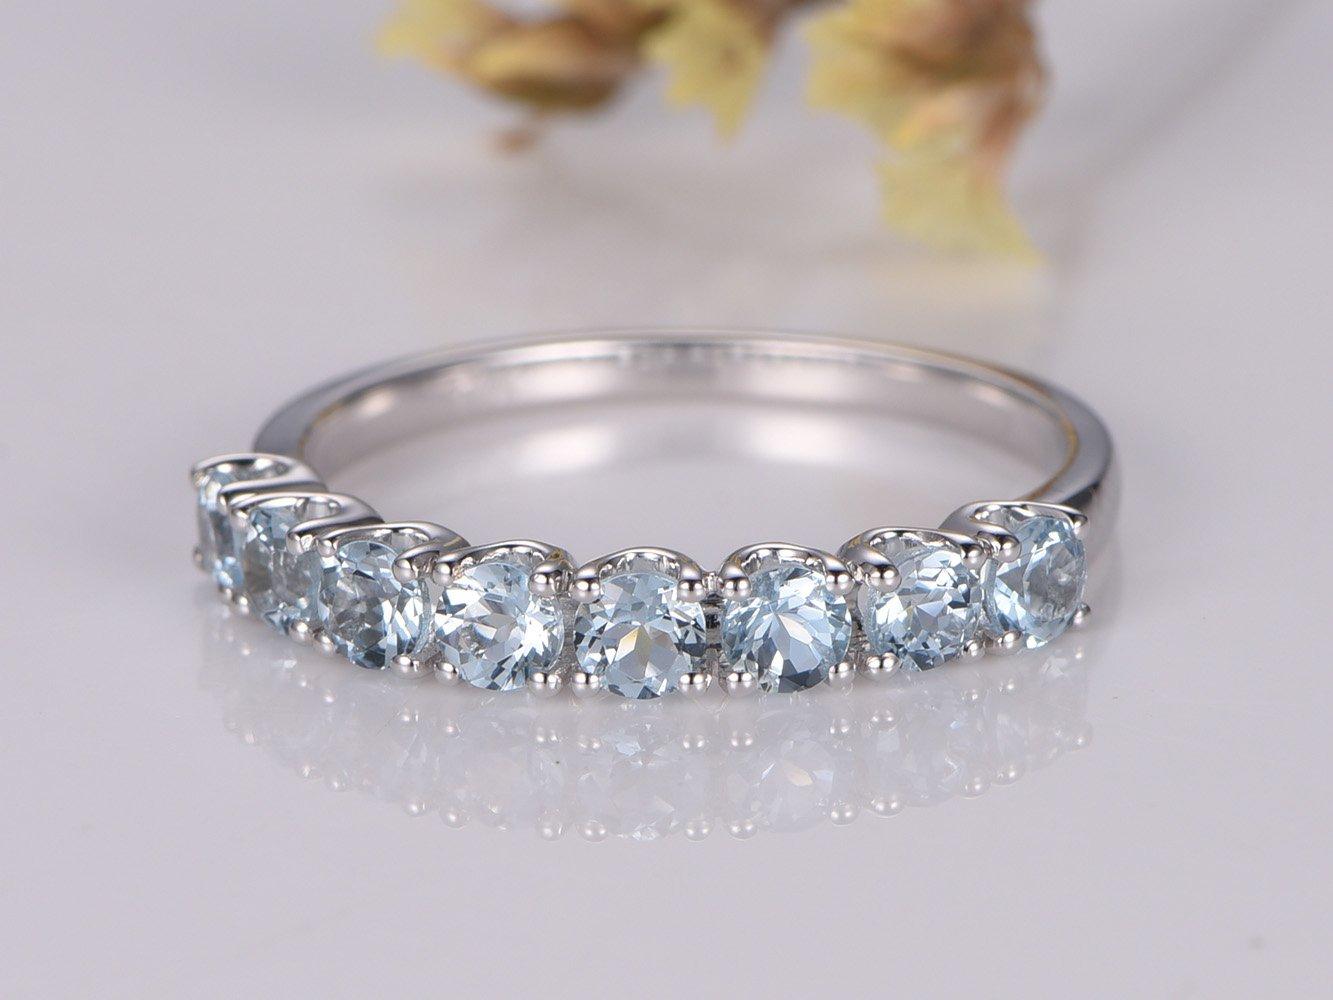 3mm VS Aquamarine Wedding Band 14K White Gold Engagement Ring, 1/2 Eternity Bridal Wedding Band Deco Promise Ring Anniversary Ring